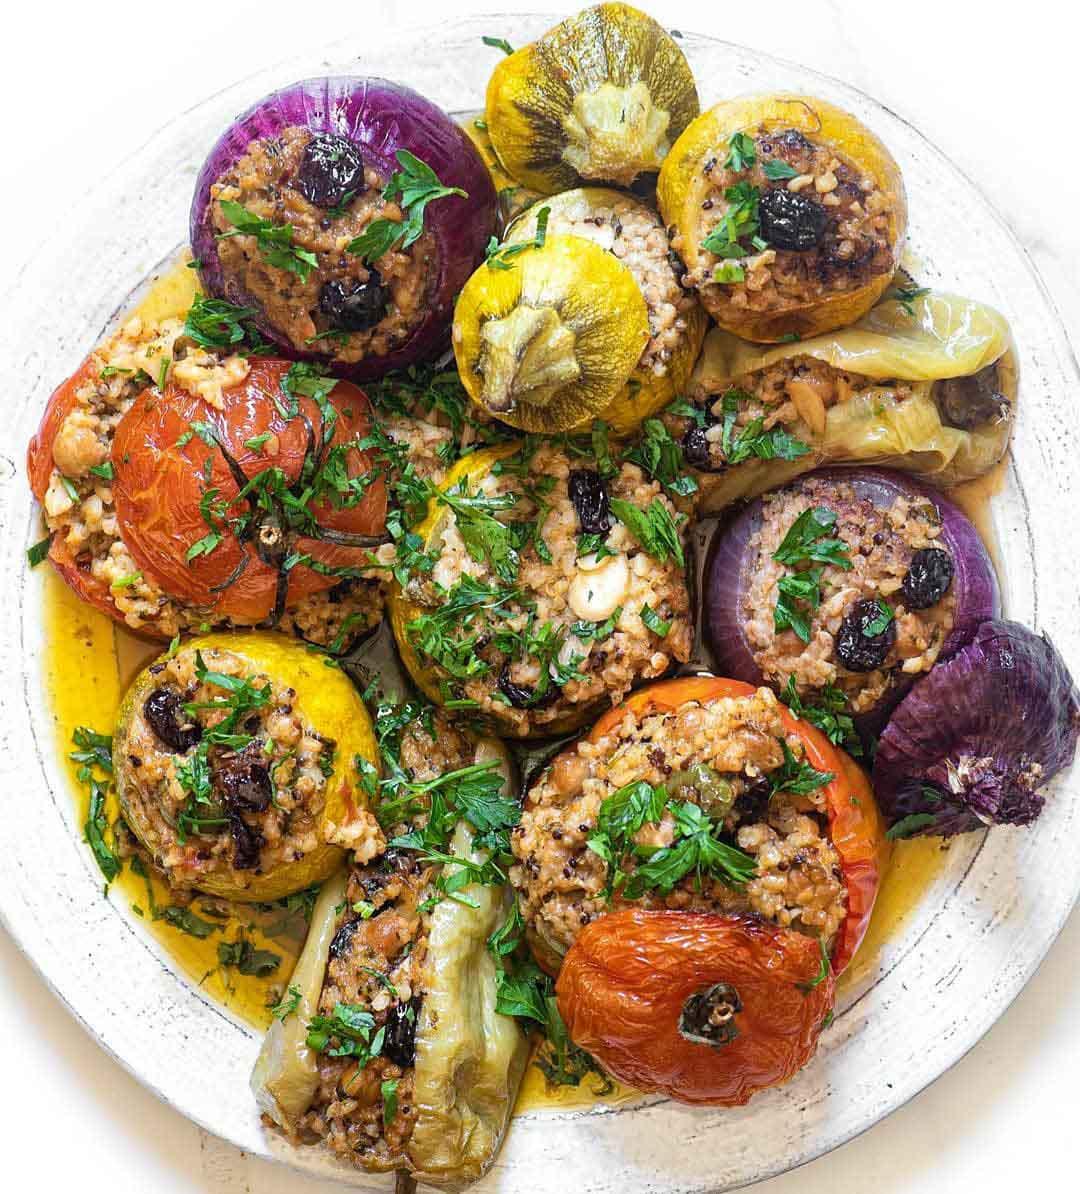 Vegan Greek Stuffed Vegetables (Gemista)